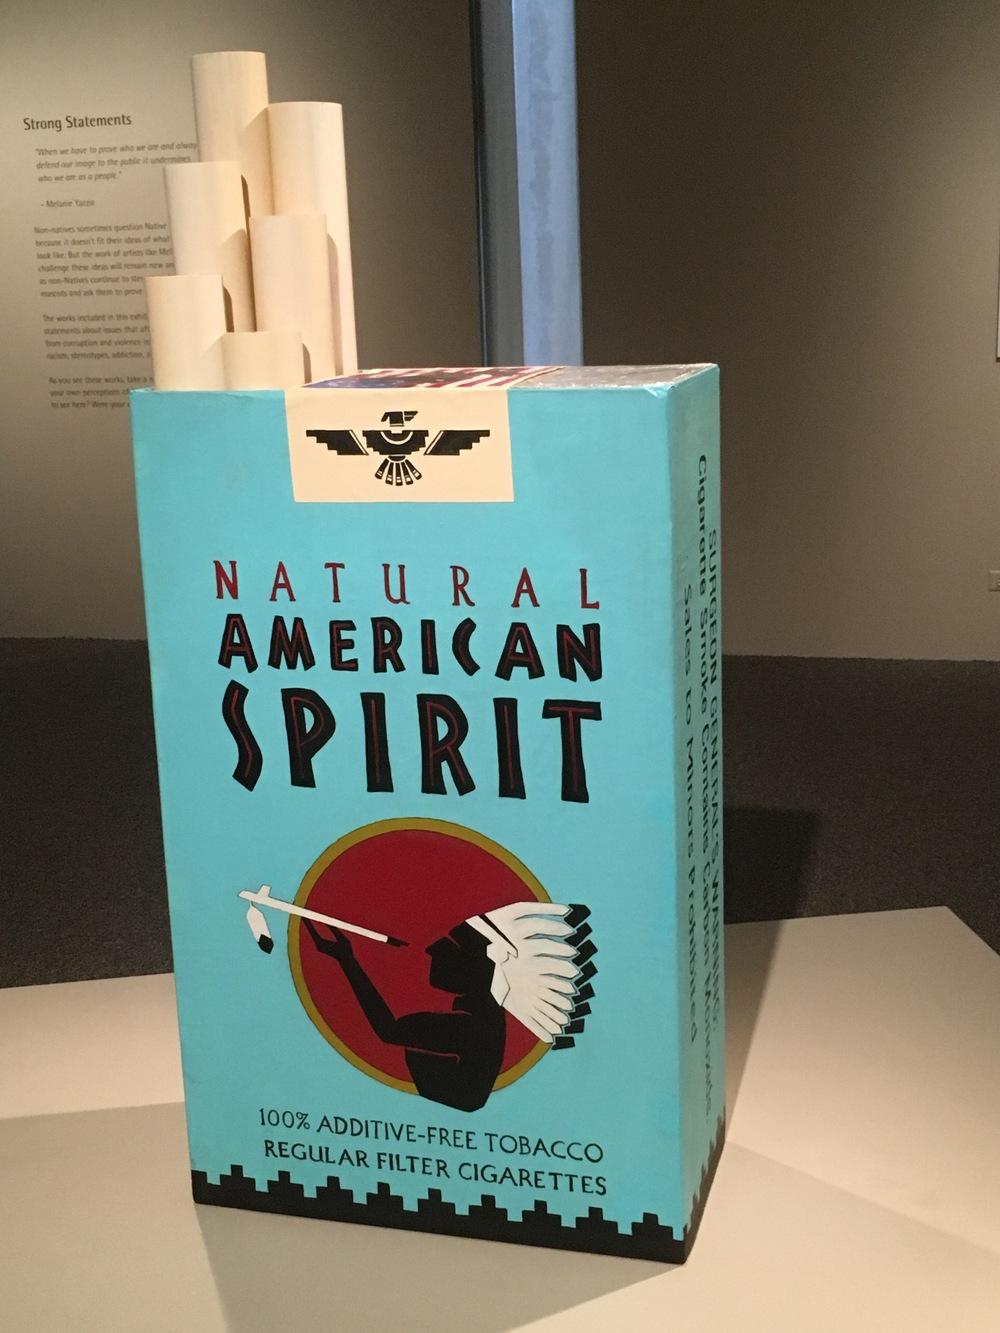 American Spirit, David P. Bradley, 2004-2005.